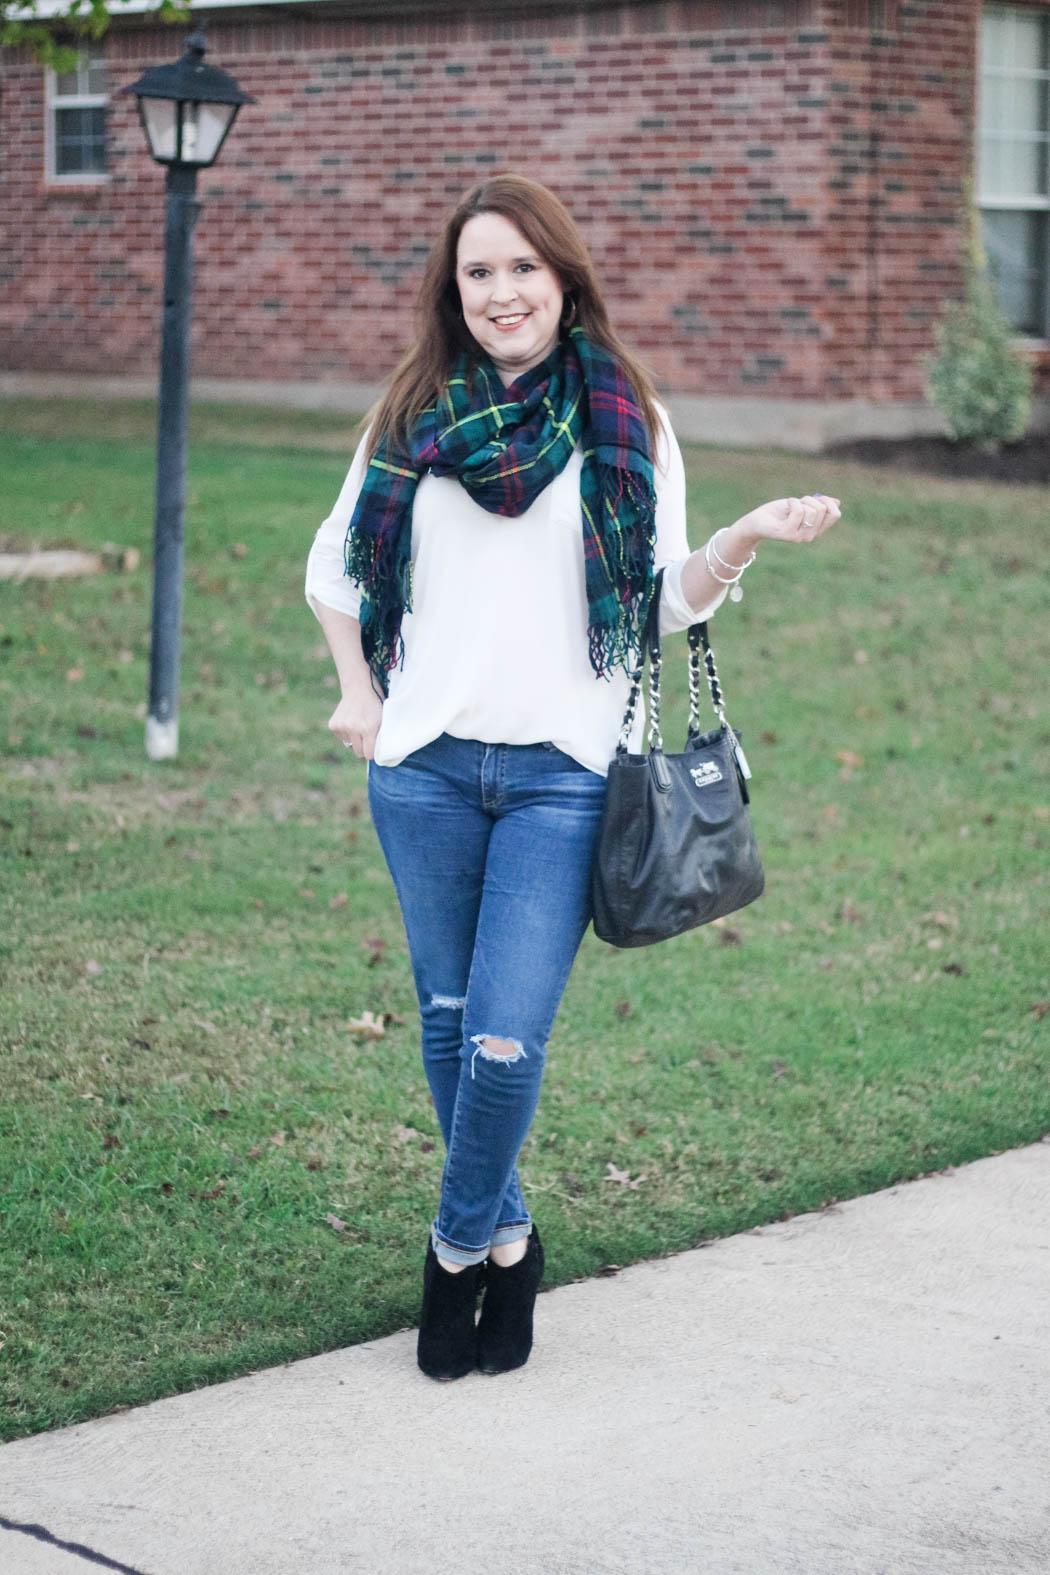 target-scarf-lush-tunic-ag-jeans-coach-bag-charles-david-booties-2